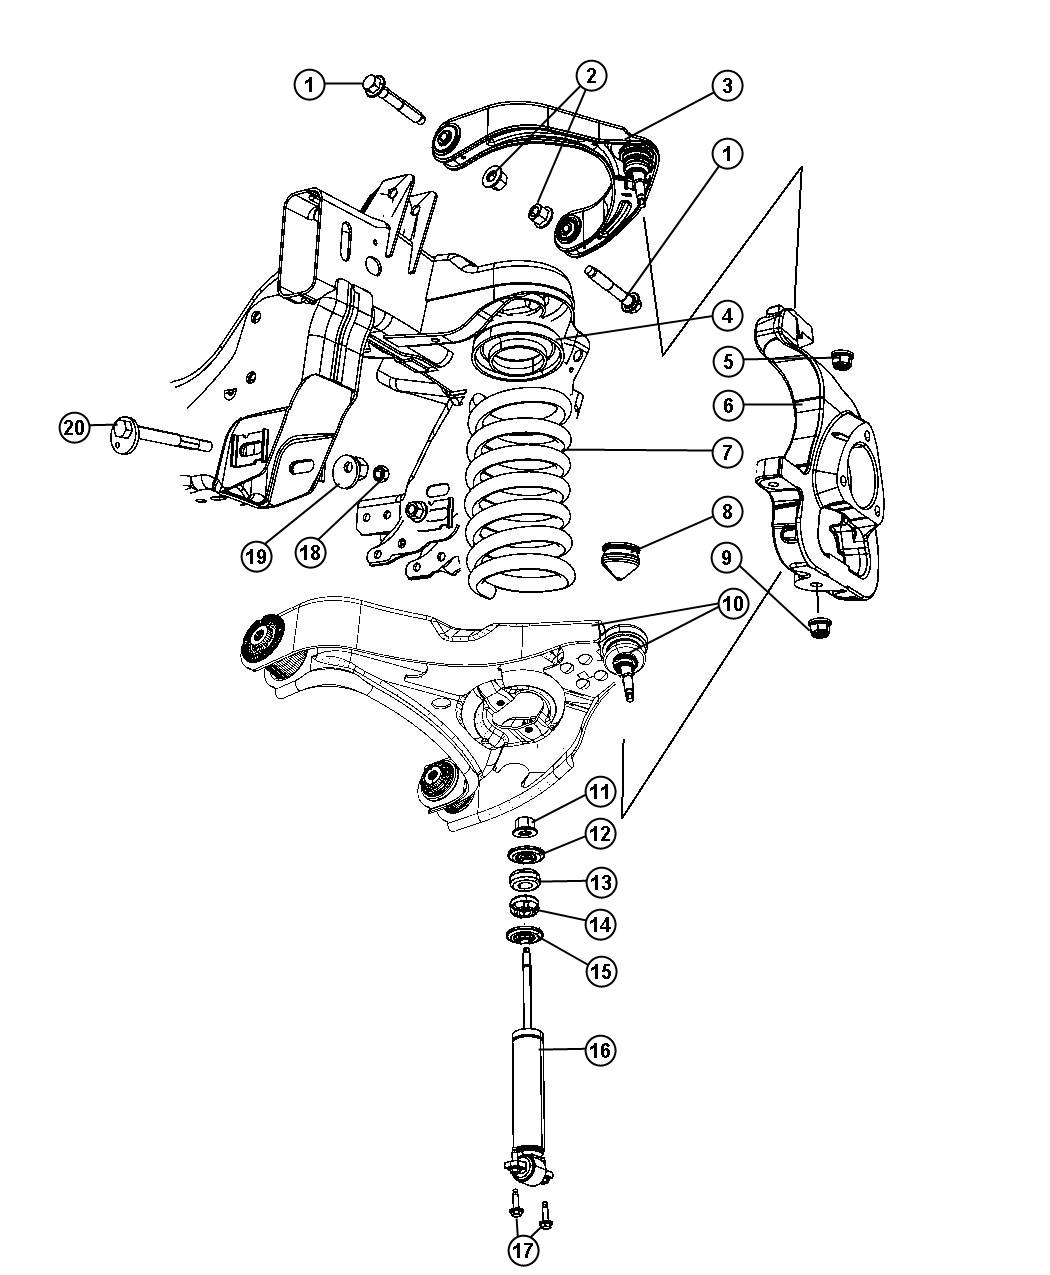 front end diagram helium atom dodge ram tie rod chevrolet